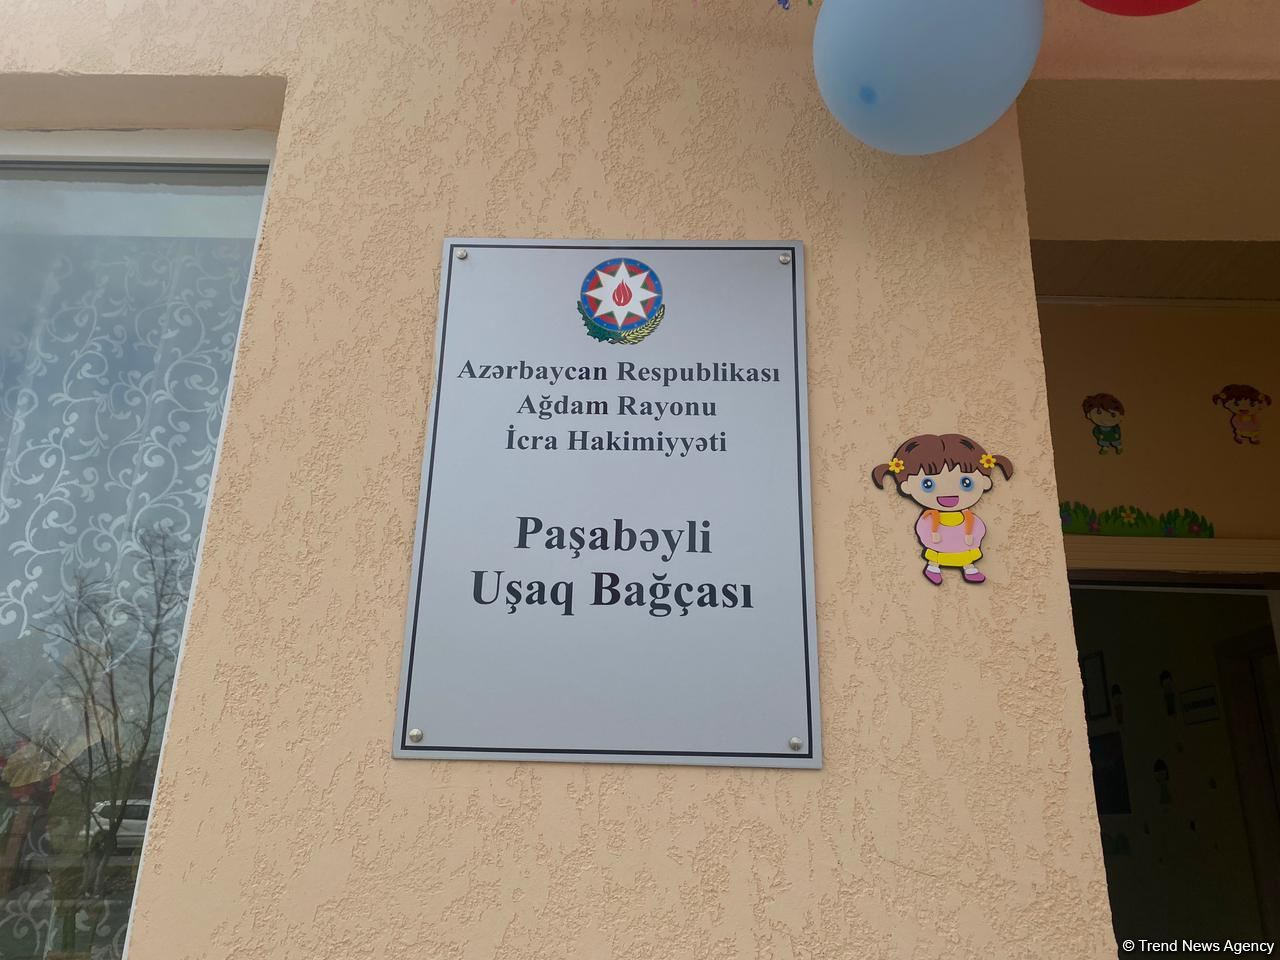 Yaponiya səfiri Ağdamda yeni bağçaçın açılışında iştirak edib - Trend TV - Gallery Image